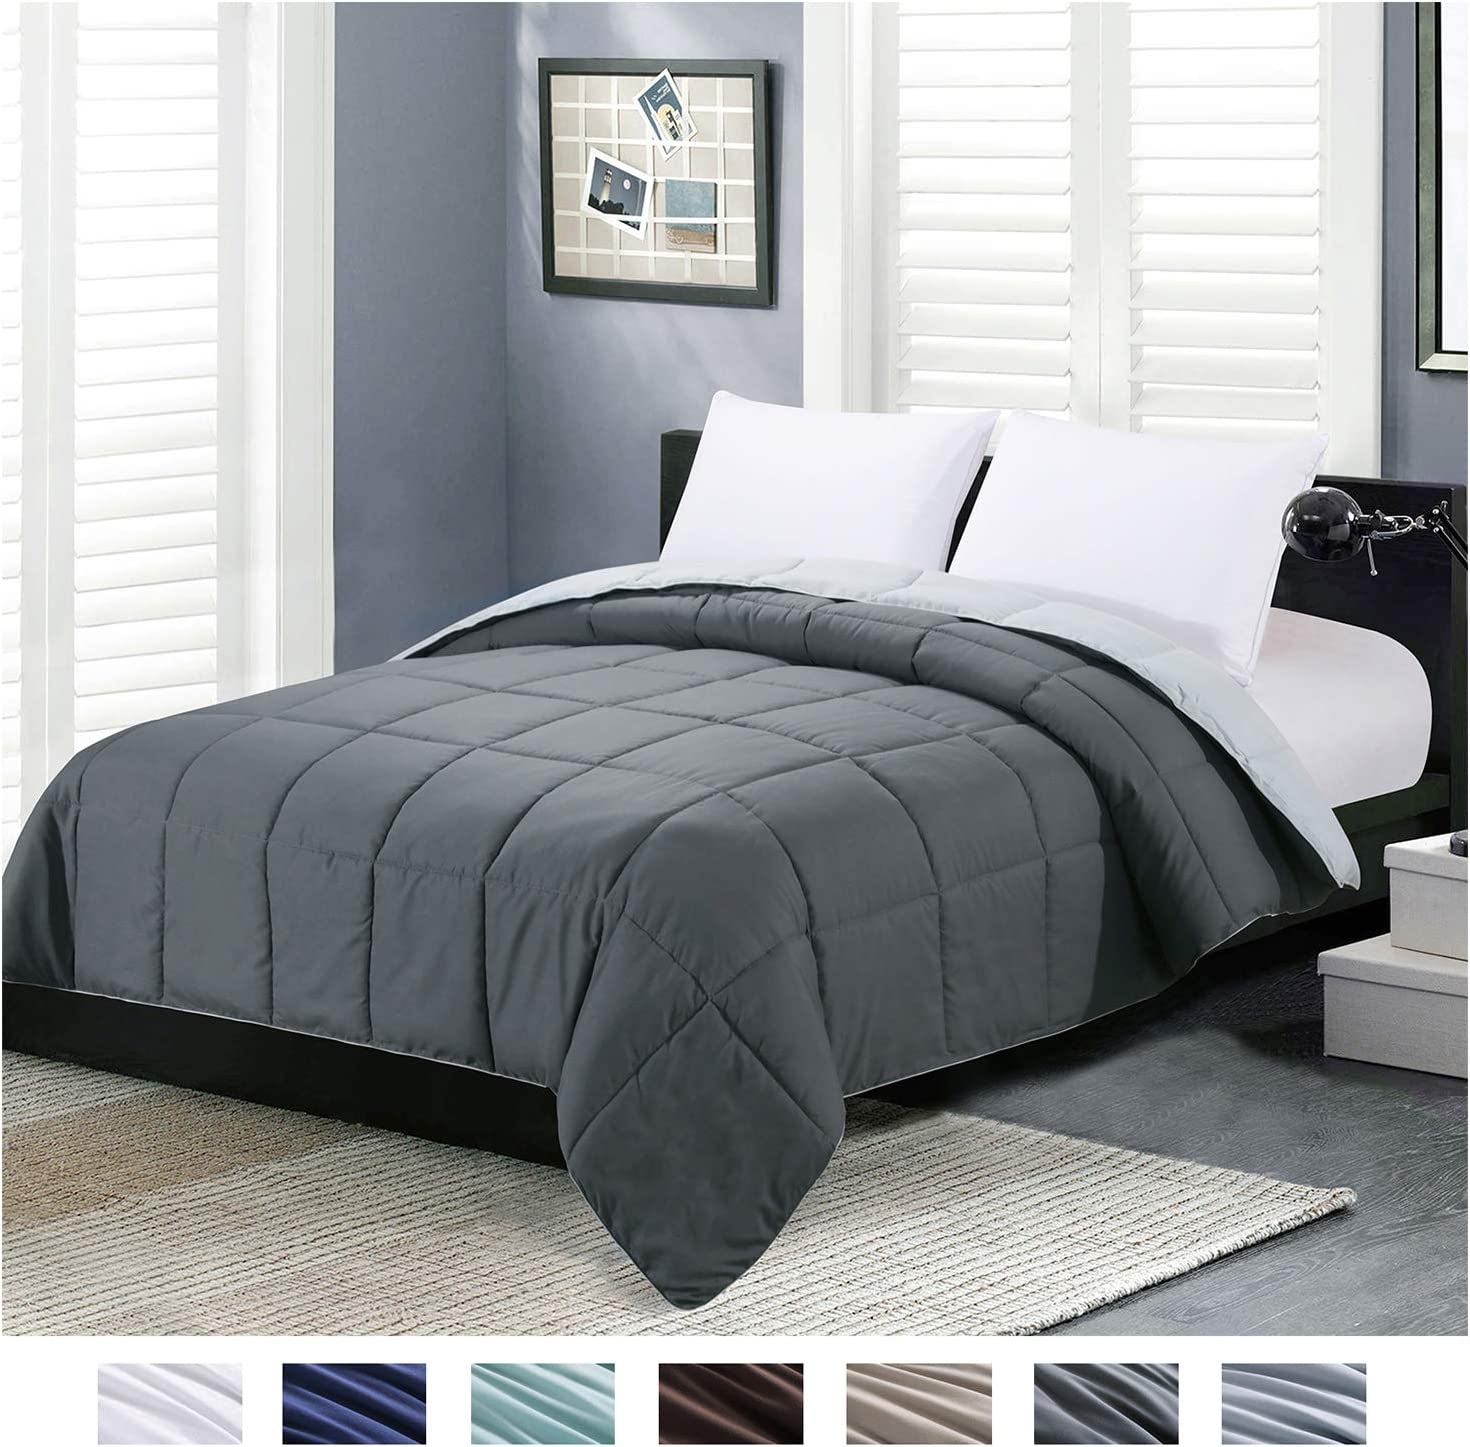 Homelike Moment Reversible Lightweight Comforter - All Season Down Alternative Comforter Twin Summer Duvet Insert Grey Quilted Bed Comforters with Corner Tabs Twin Size Dark Gray/Light Grey